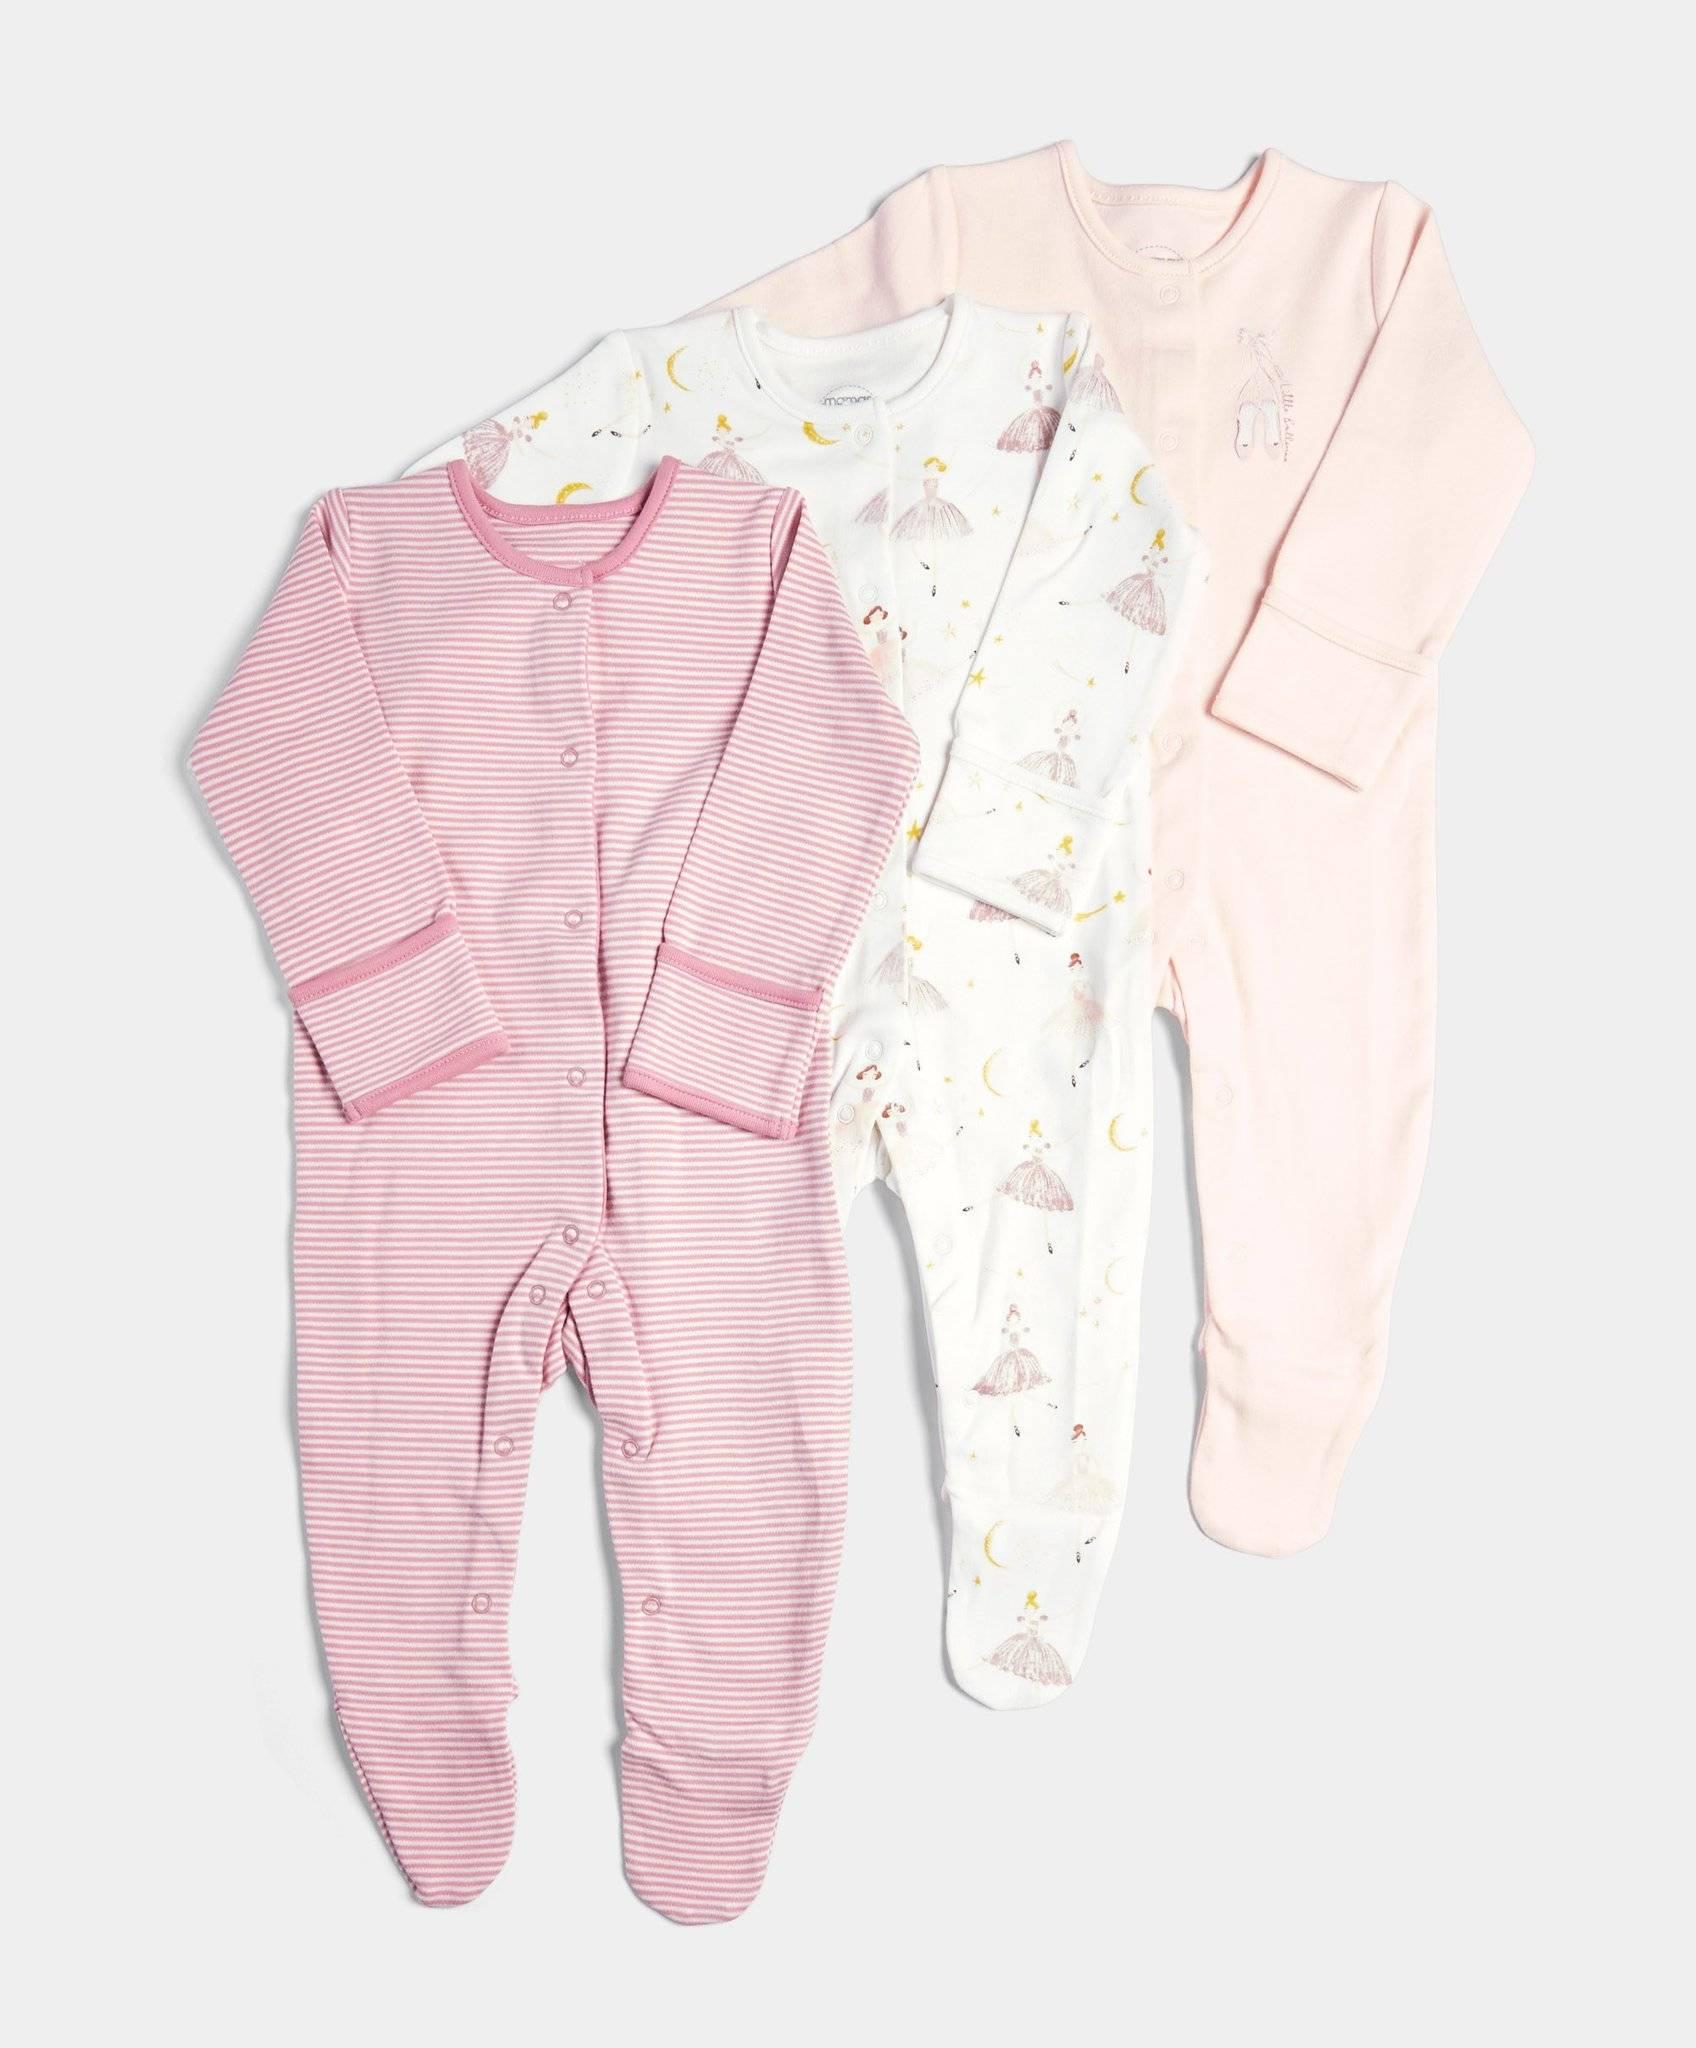 3 Pack Ballerina Sleepsuits